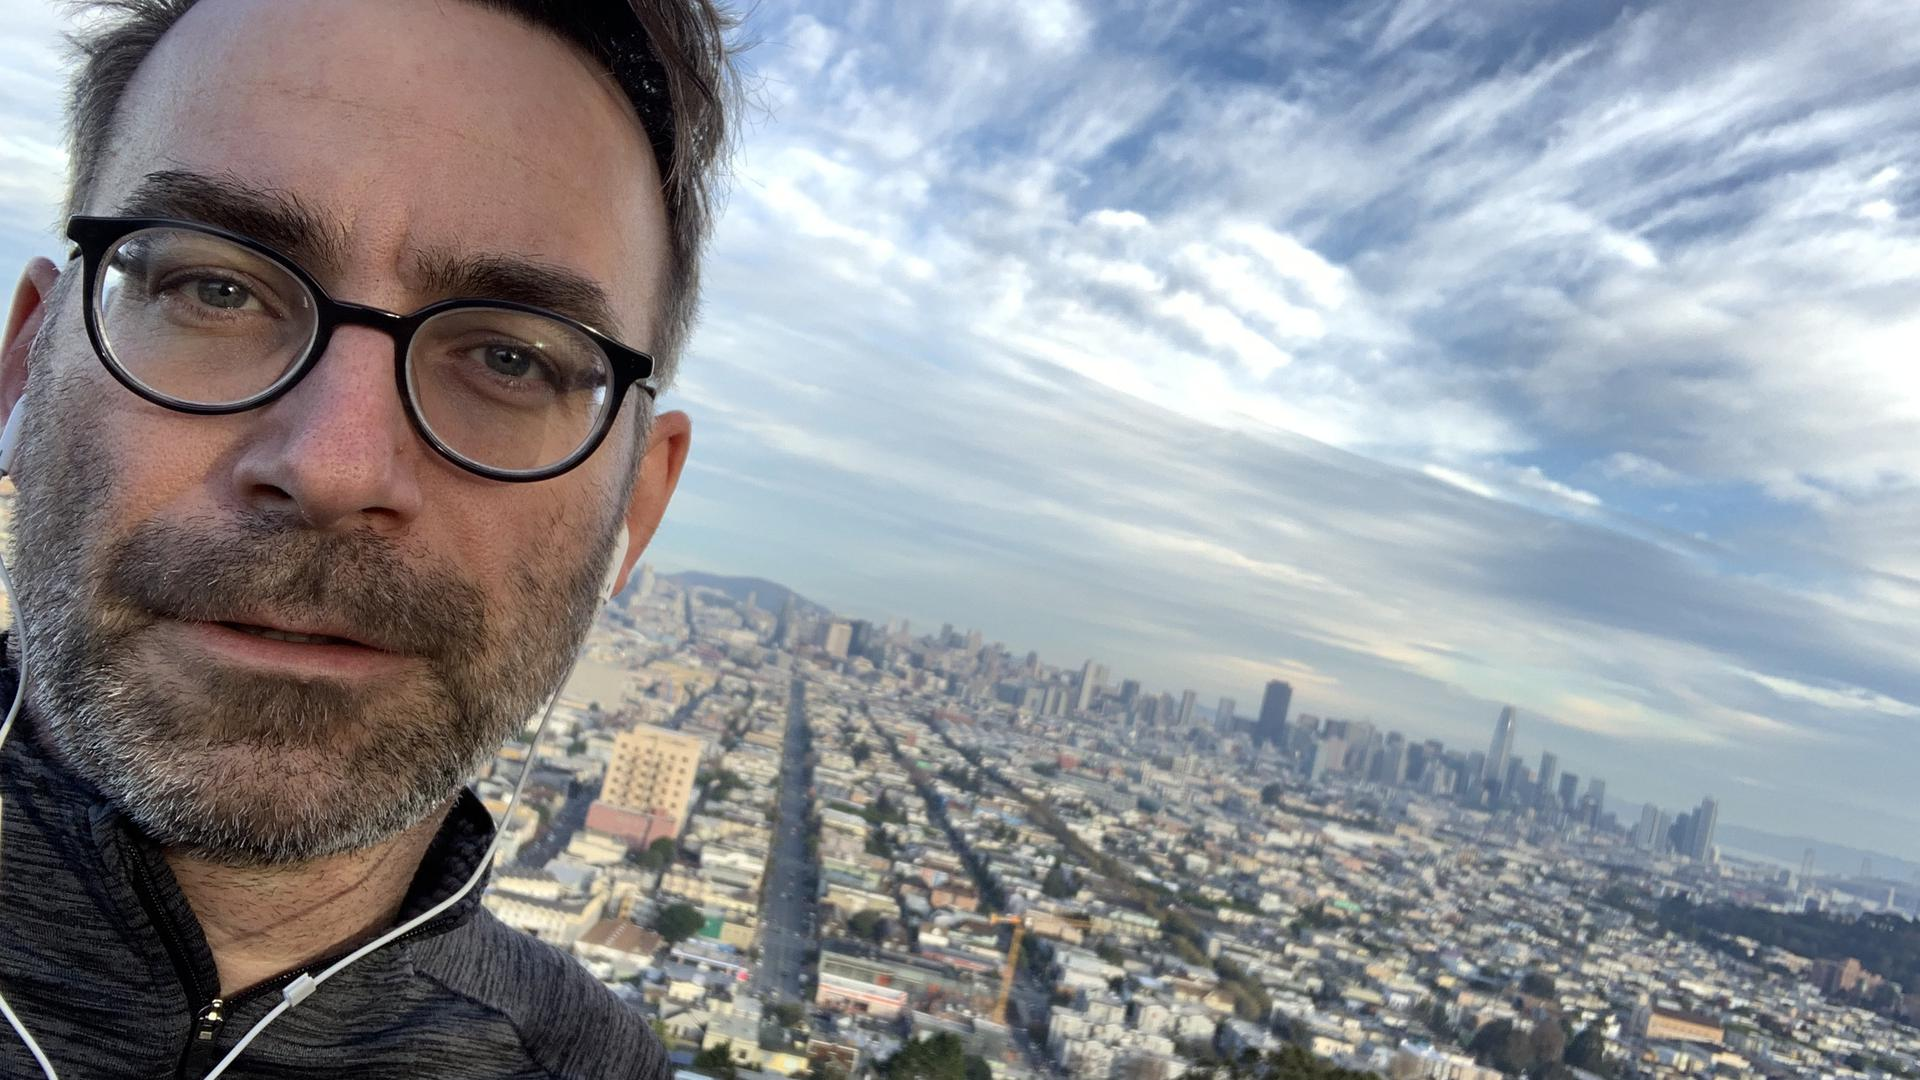 Frank Weigel in San Francisco.